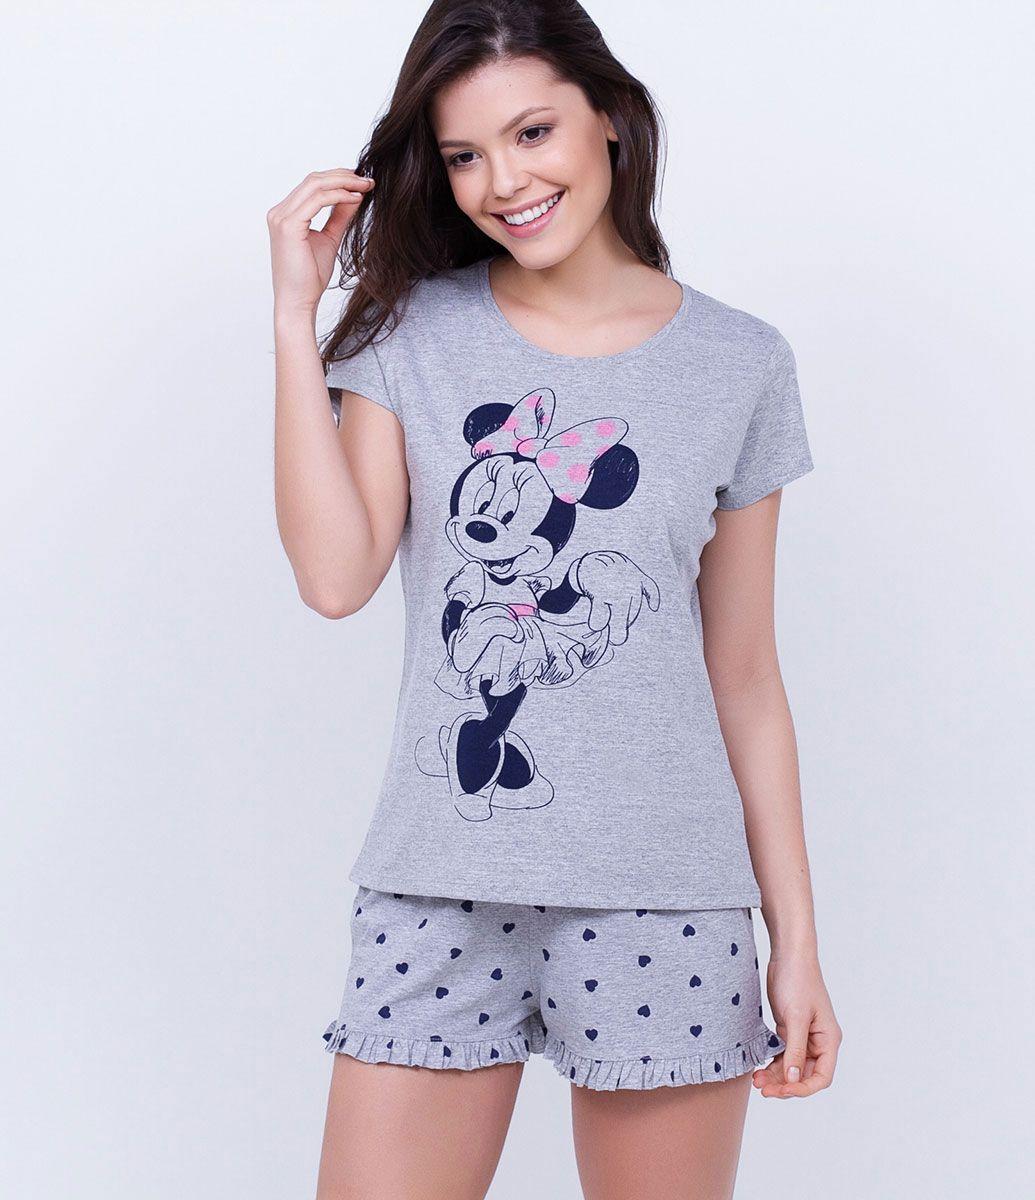 8a57b885be7dca Pijama Short Doll com Estampa Minnie - Lojas Renner | Disney Things ...